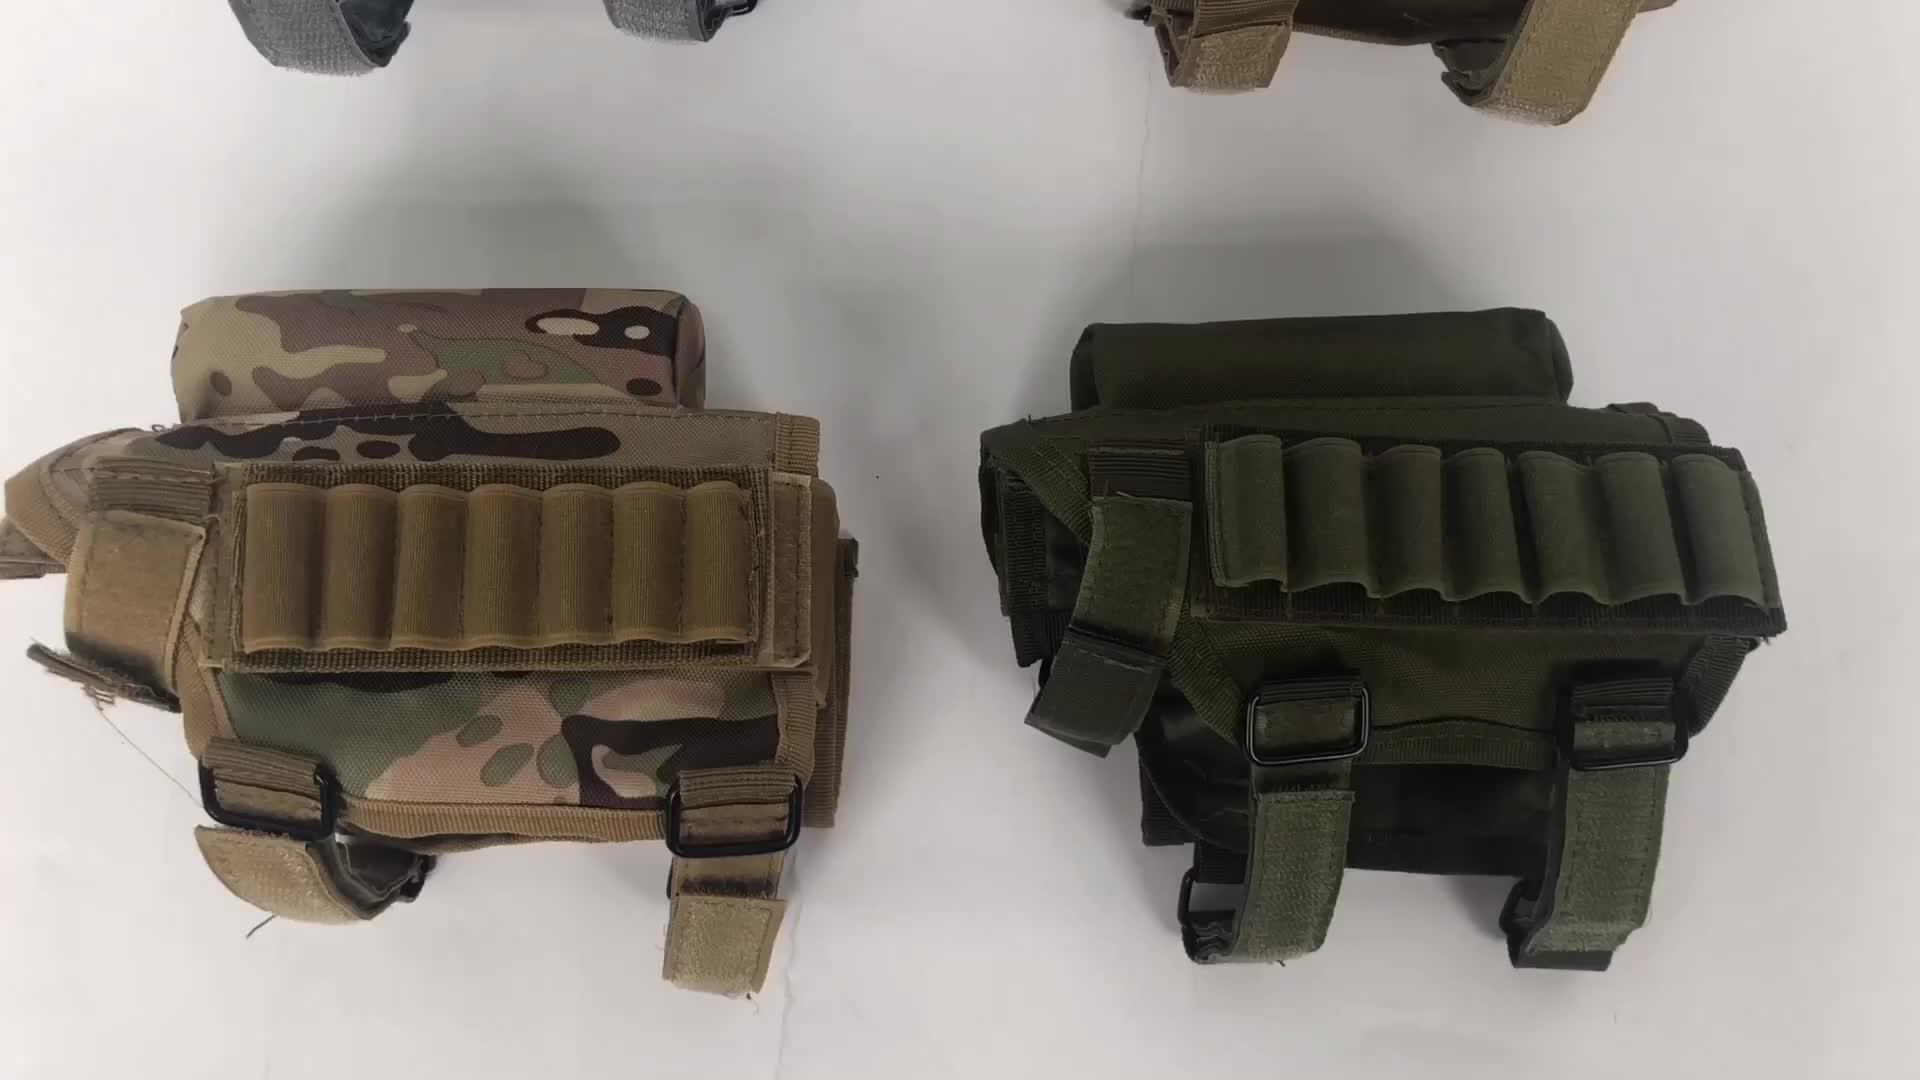 आउटडोर शिकार समायोज्य सामरिक शूटिंग राइफल Buttstock गाल बारूद के साथ बाकी वाहक मामले